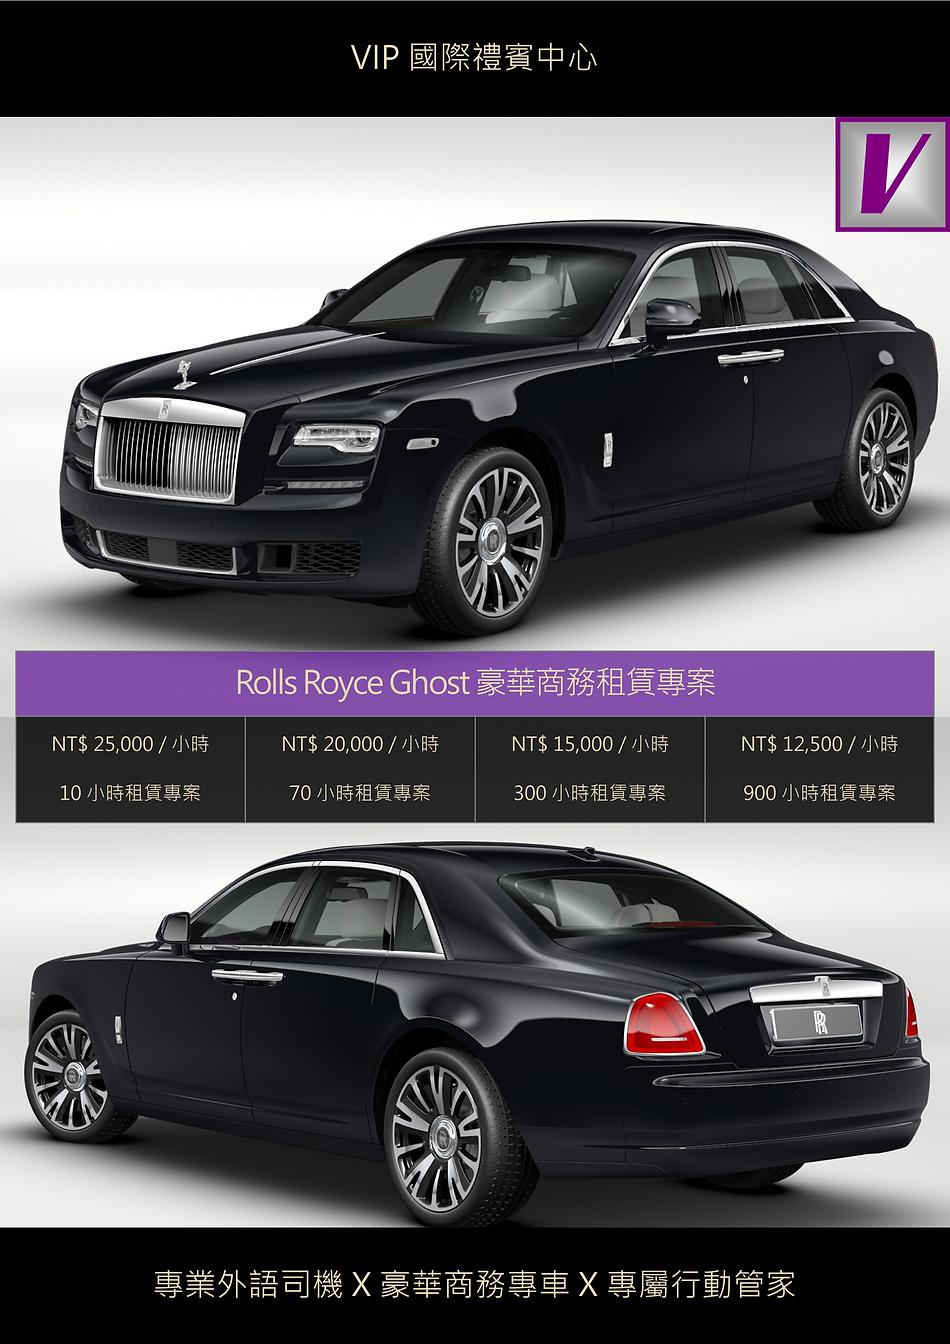 VIP國際禮賓中心 ROLLS ROYCE GHOST BLACK 豪華商務租賃專案 DM.png